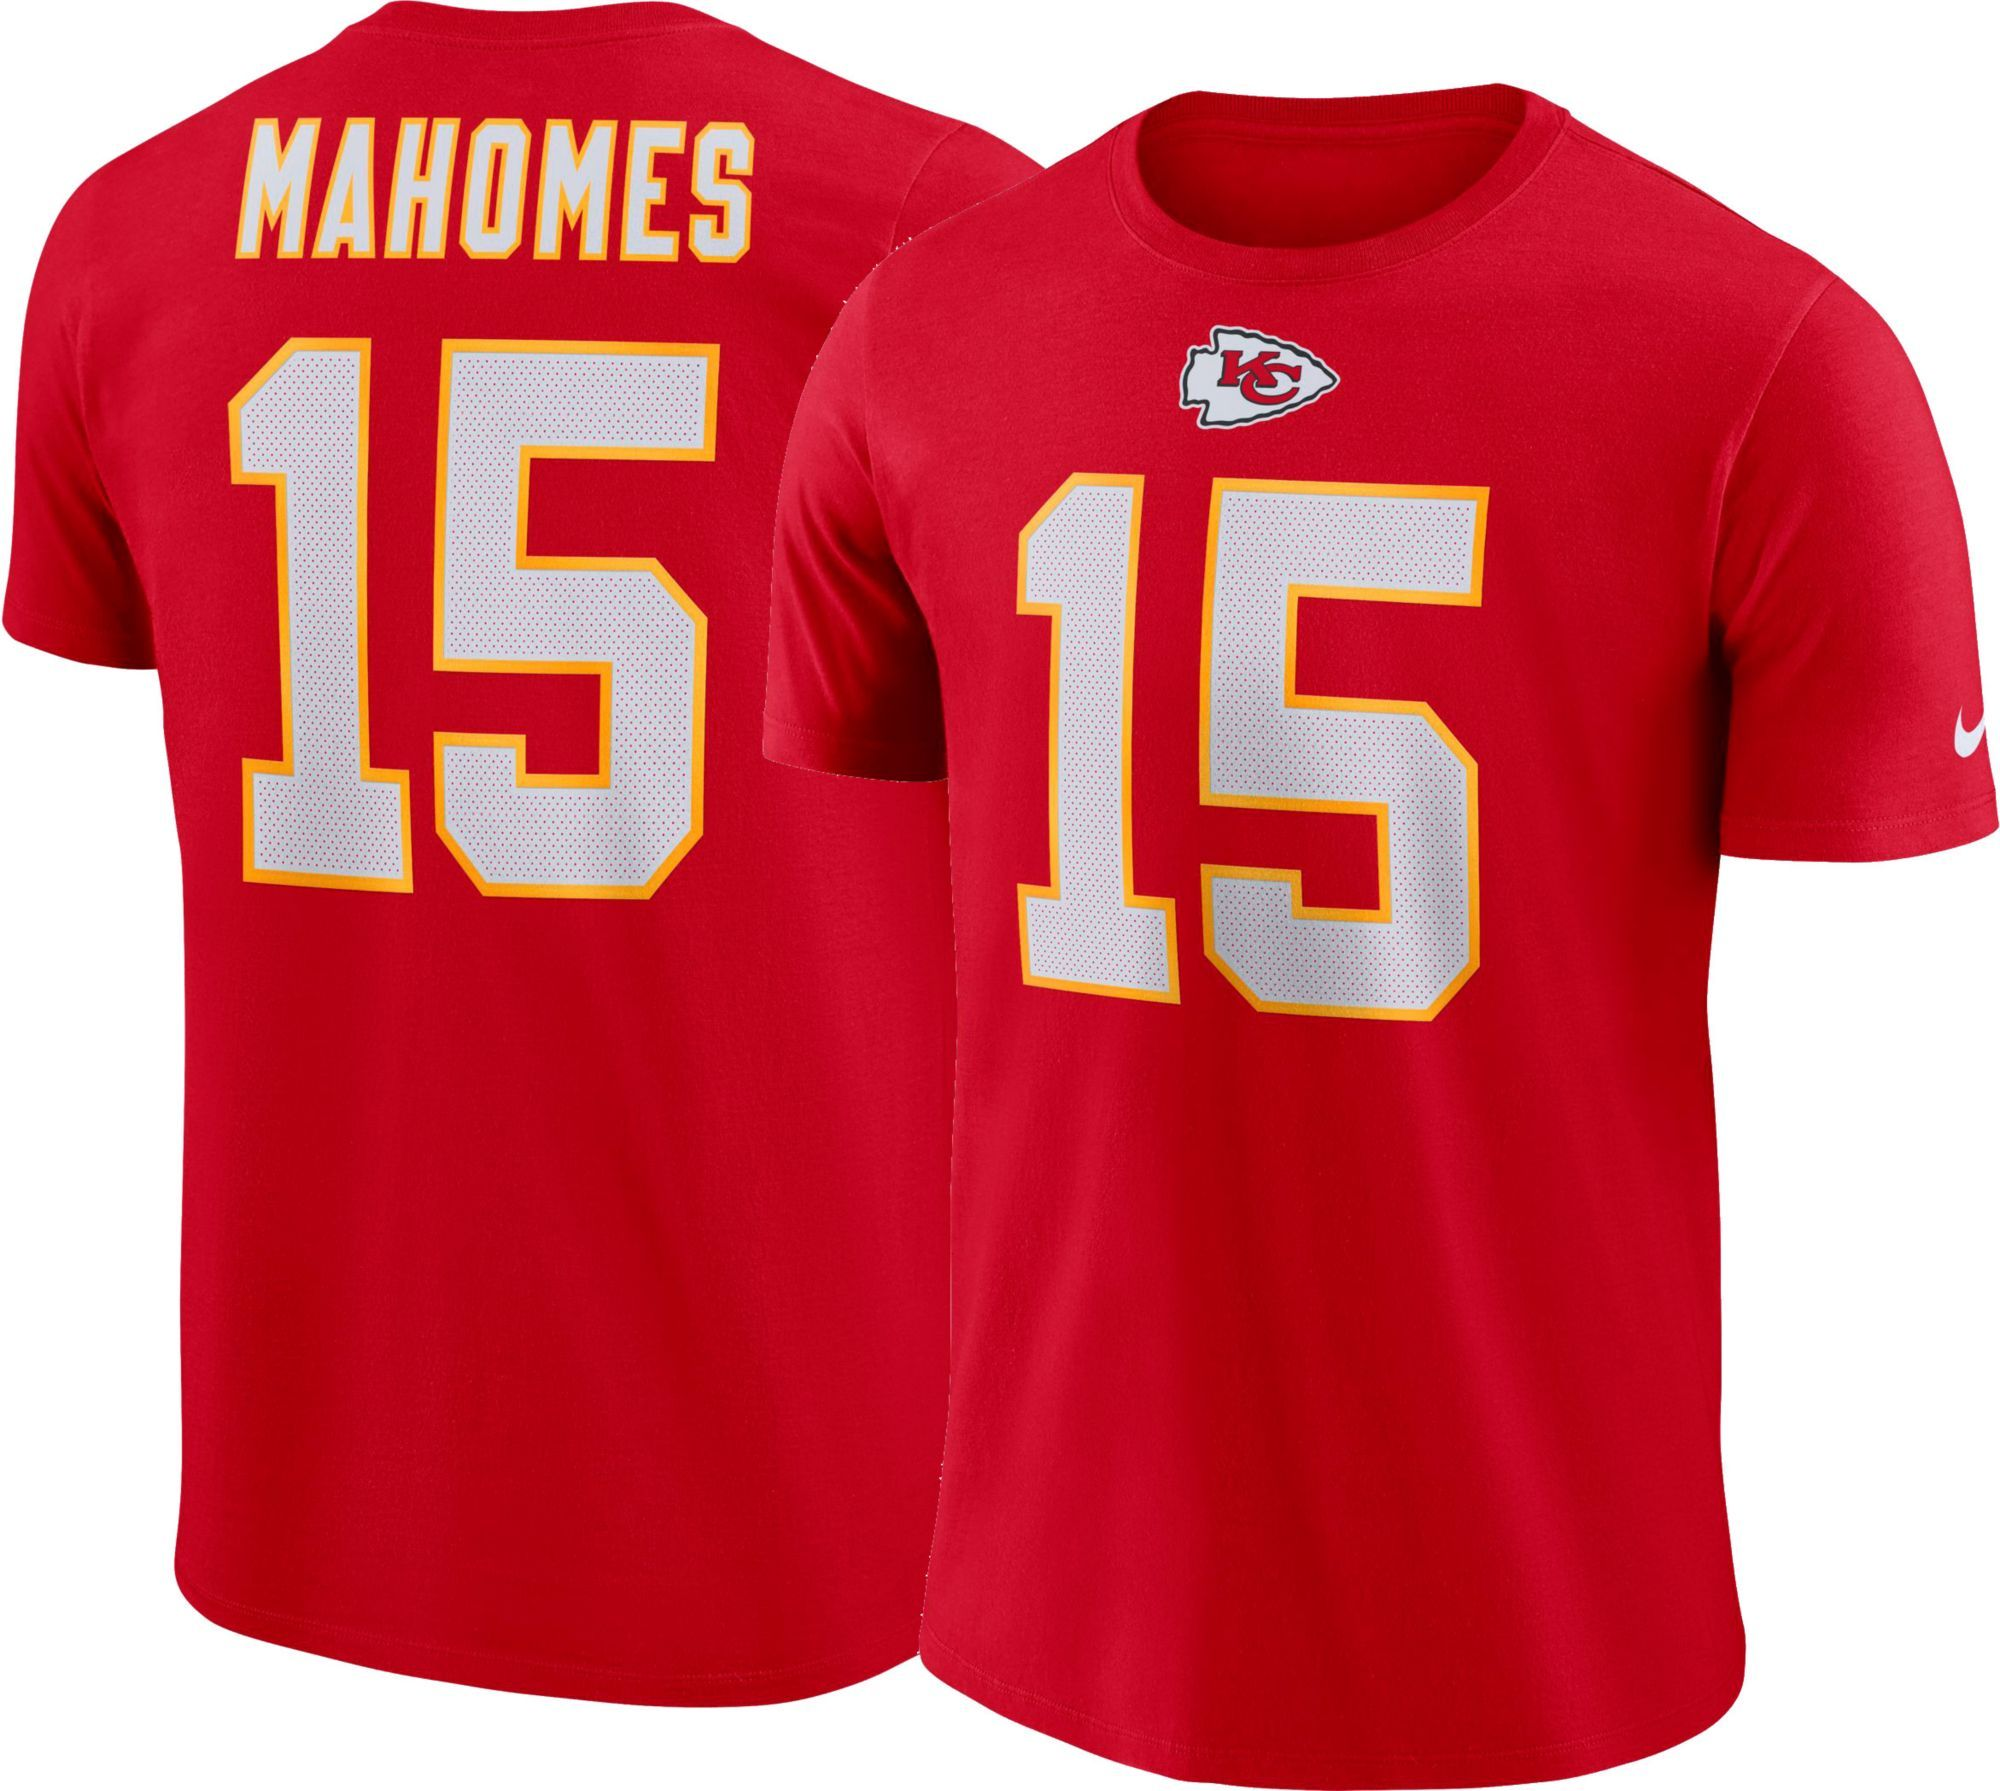 74c357c1121 Patrick Mahomes  15 Nike Men s Kansas City Pride Red T-Shirt in 2019 ...